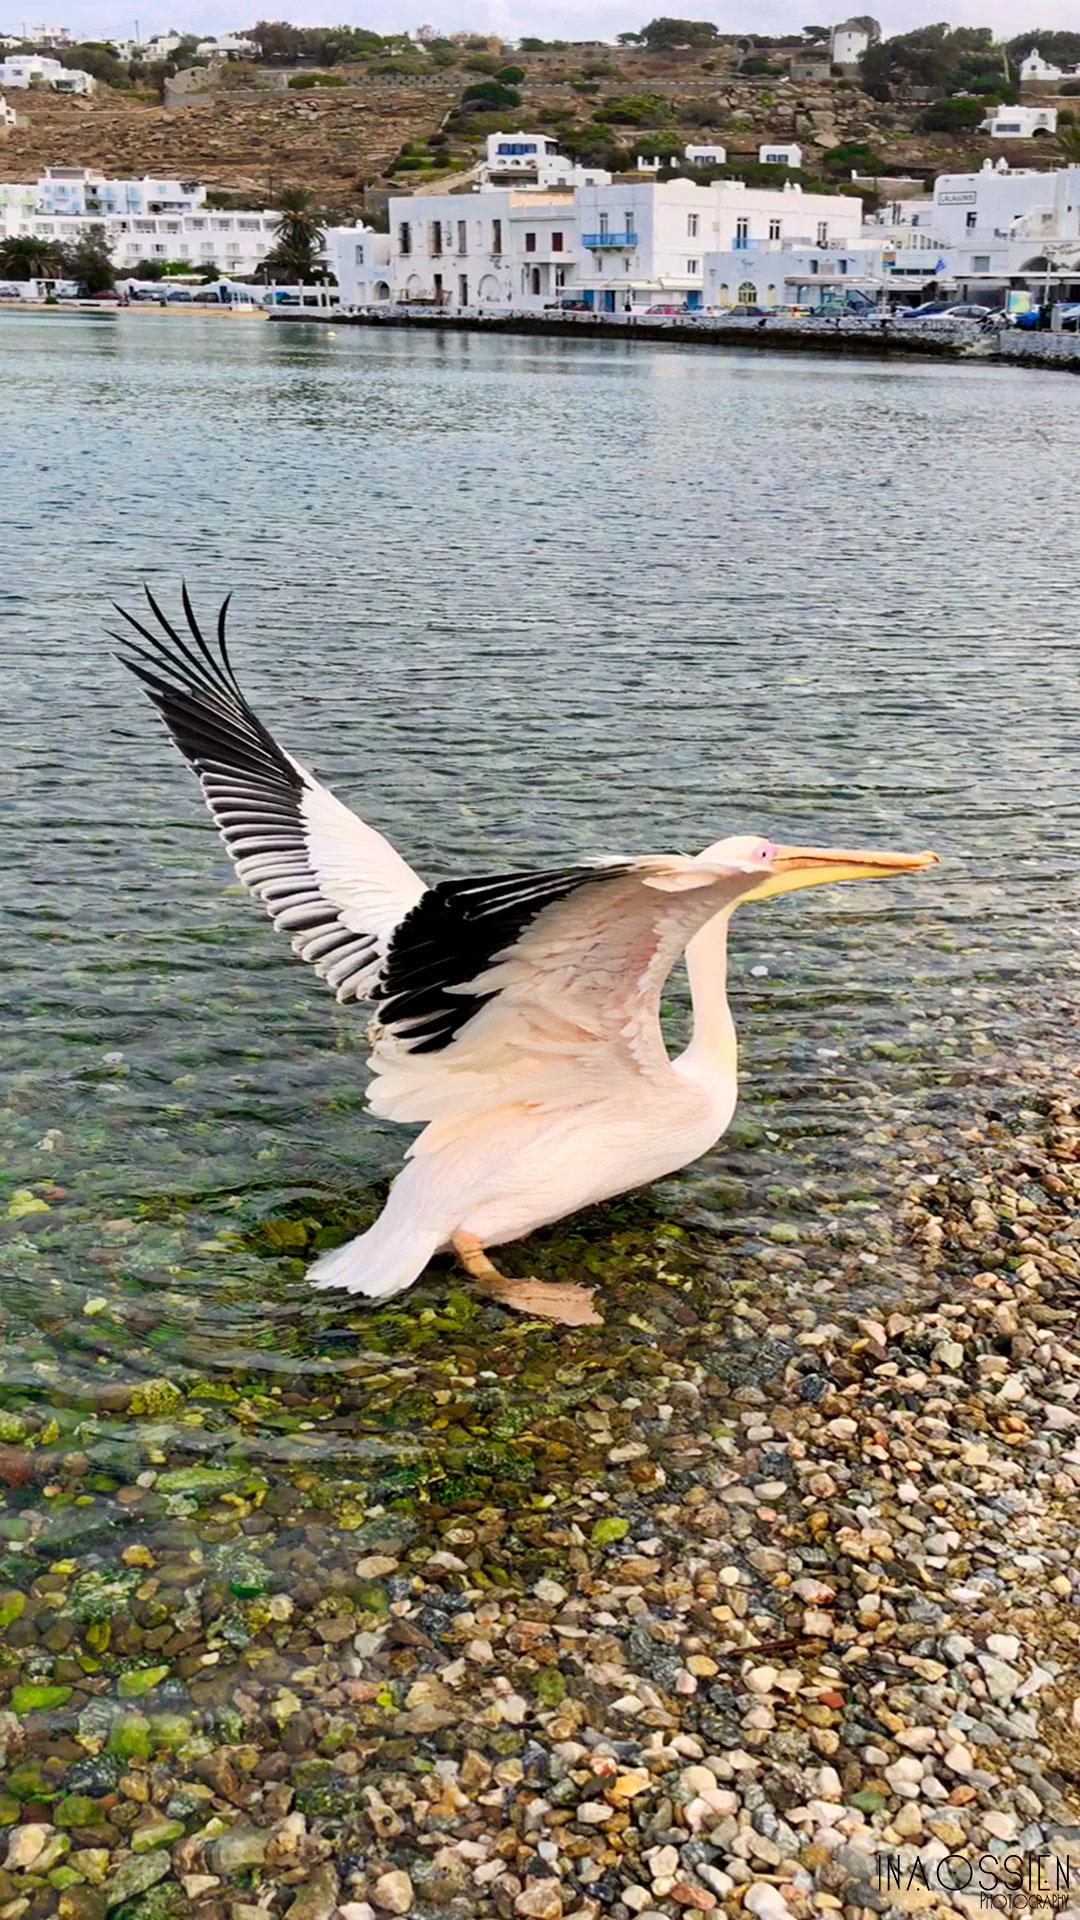 Peter the Pelican - The Superstar!